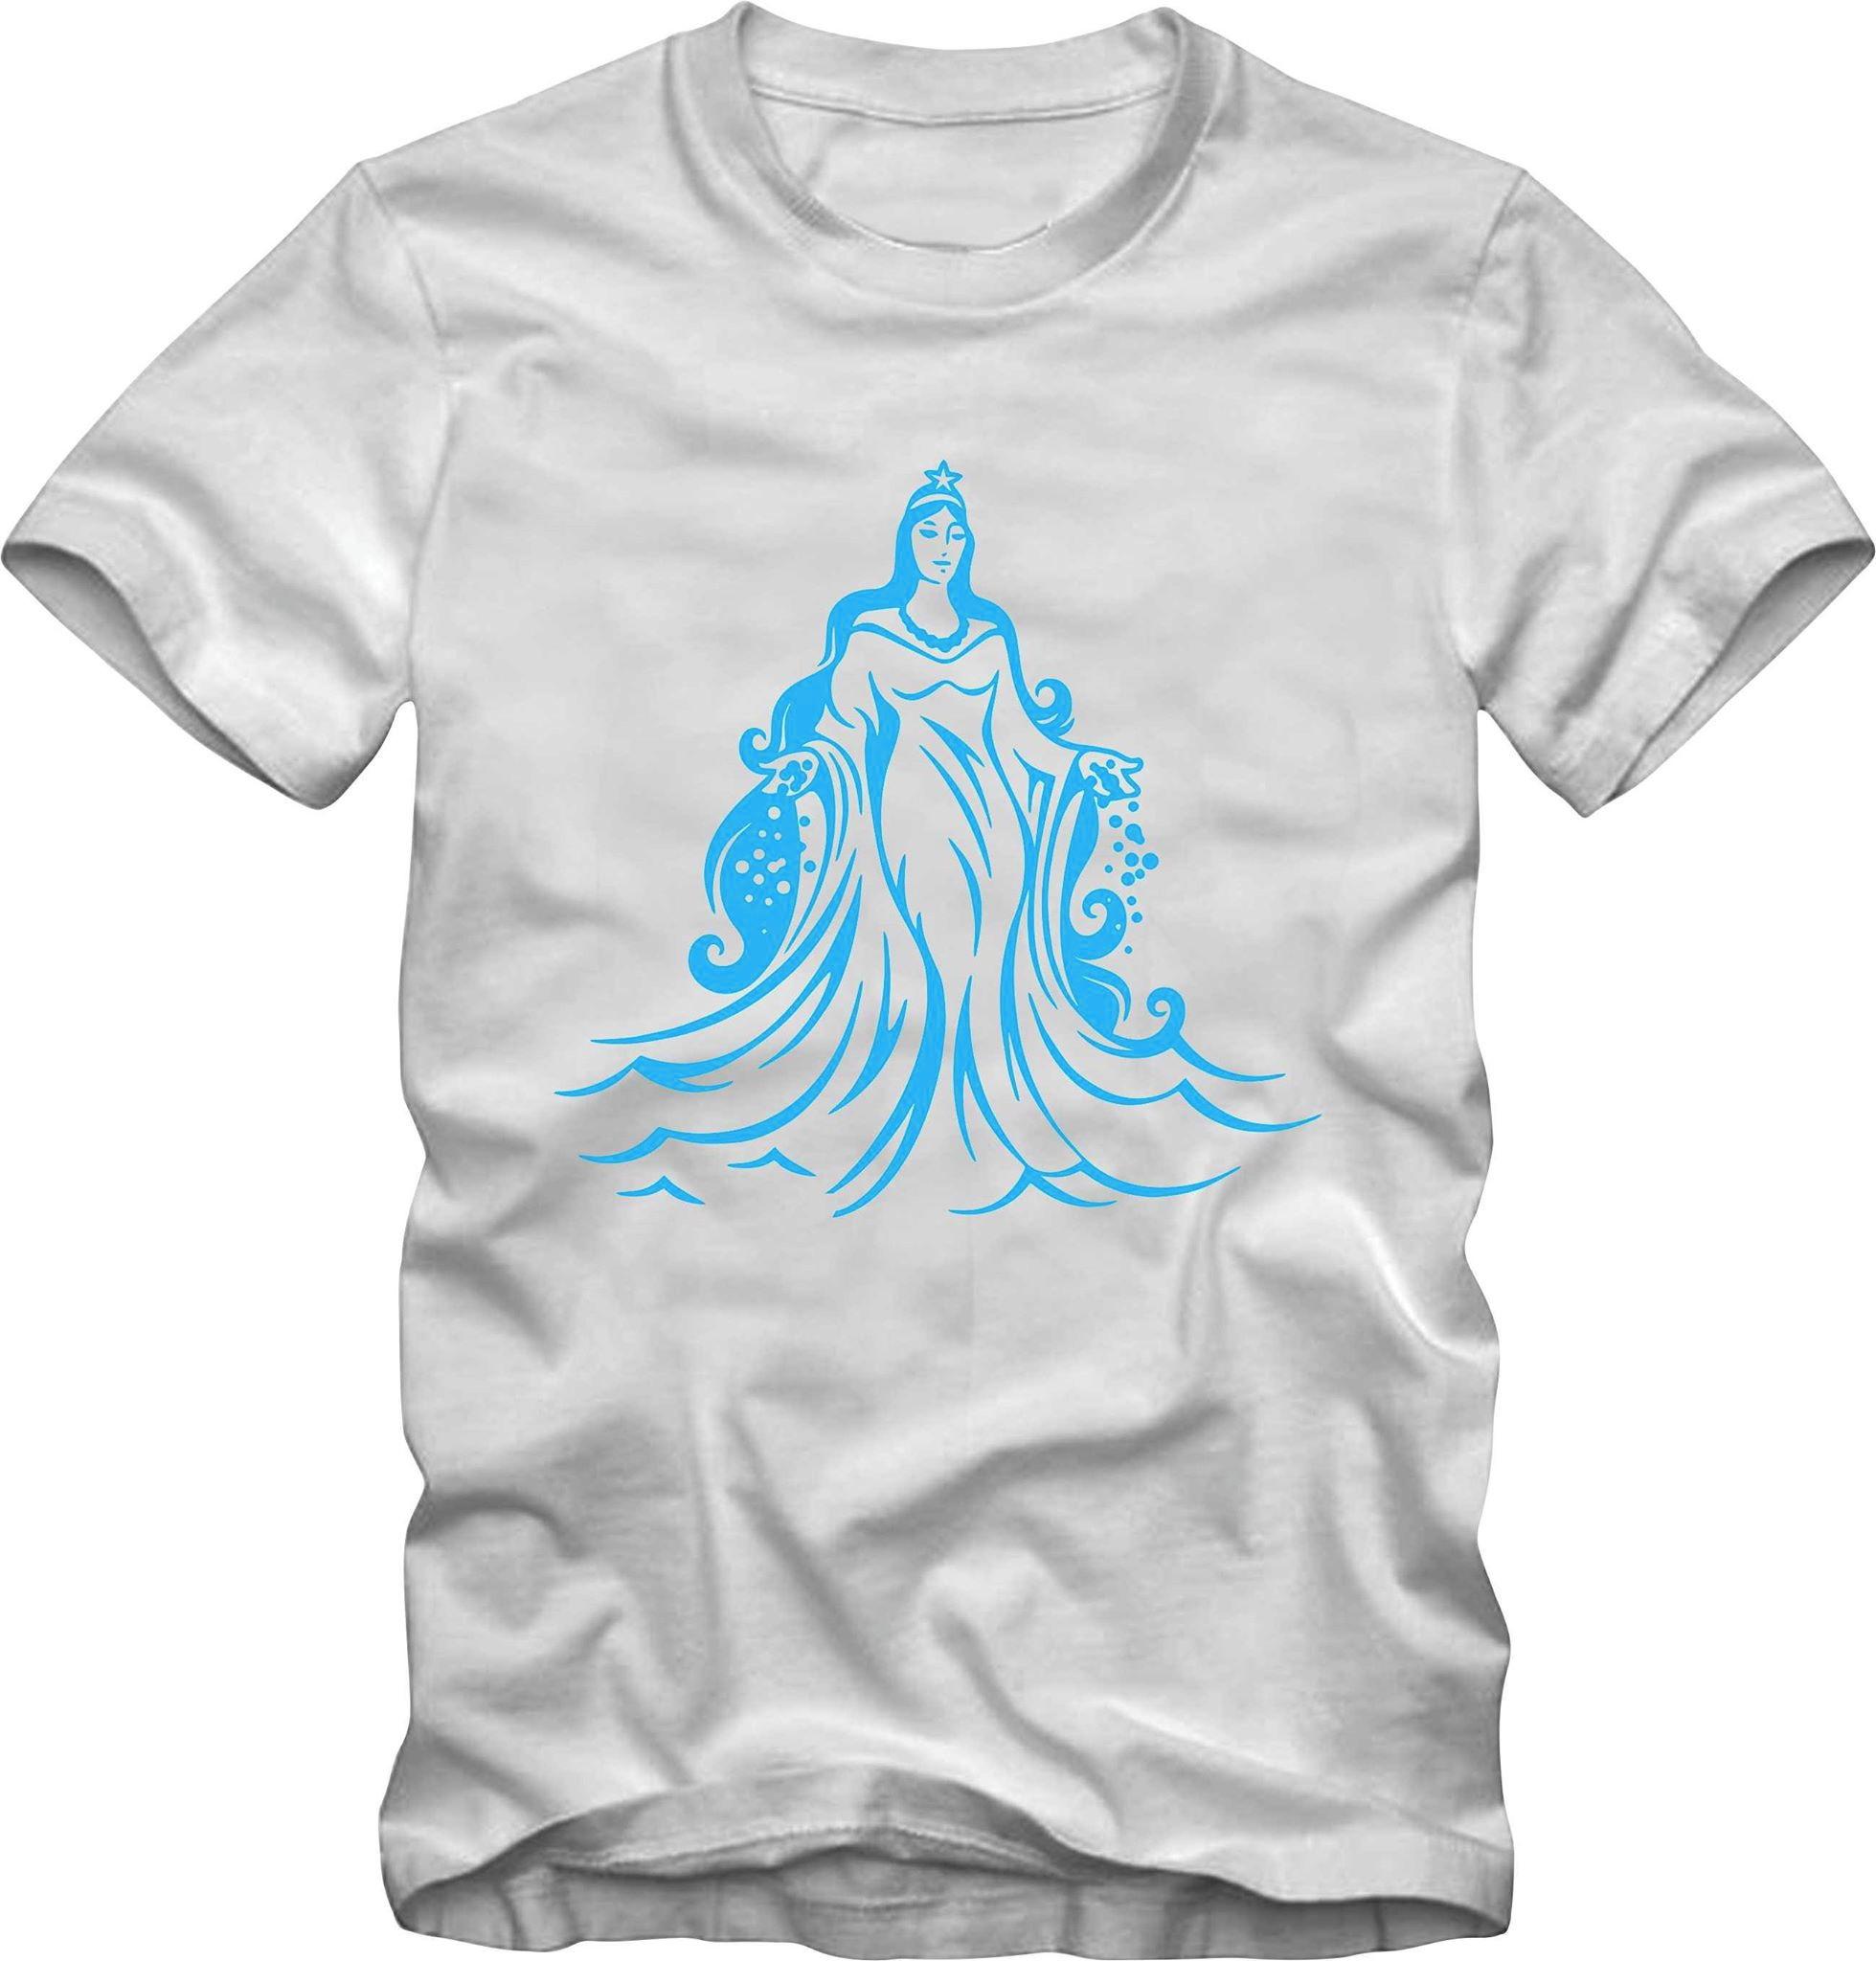 c9494038244 Camiseta Camisa Orixá Iemanjá Tamanho Especial Plus Size